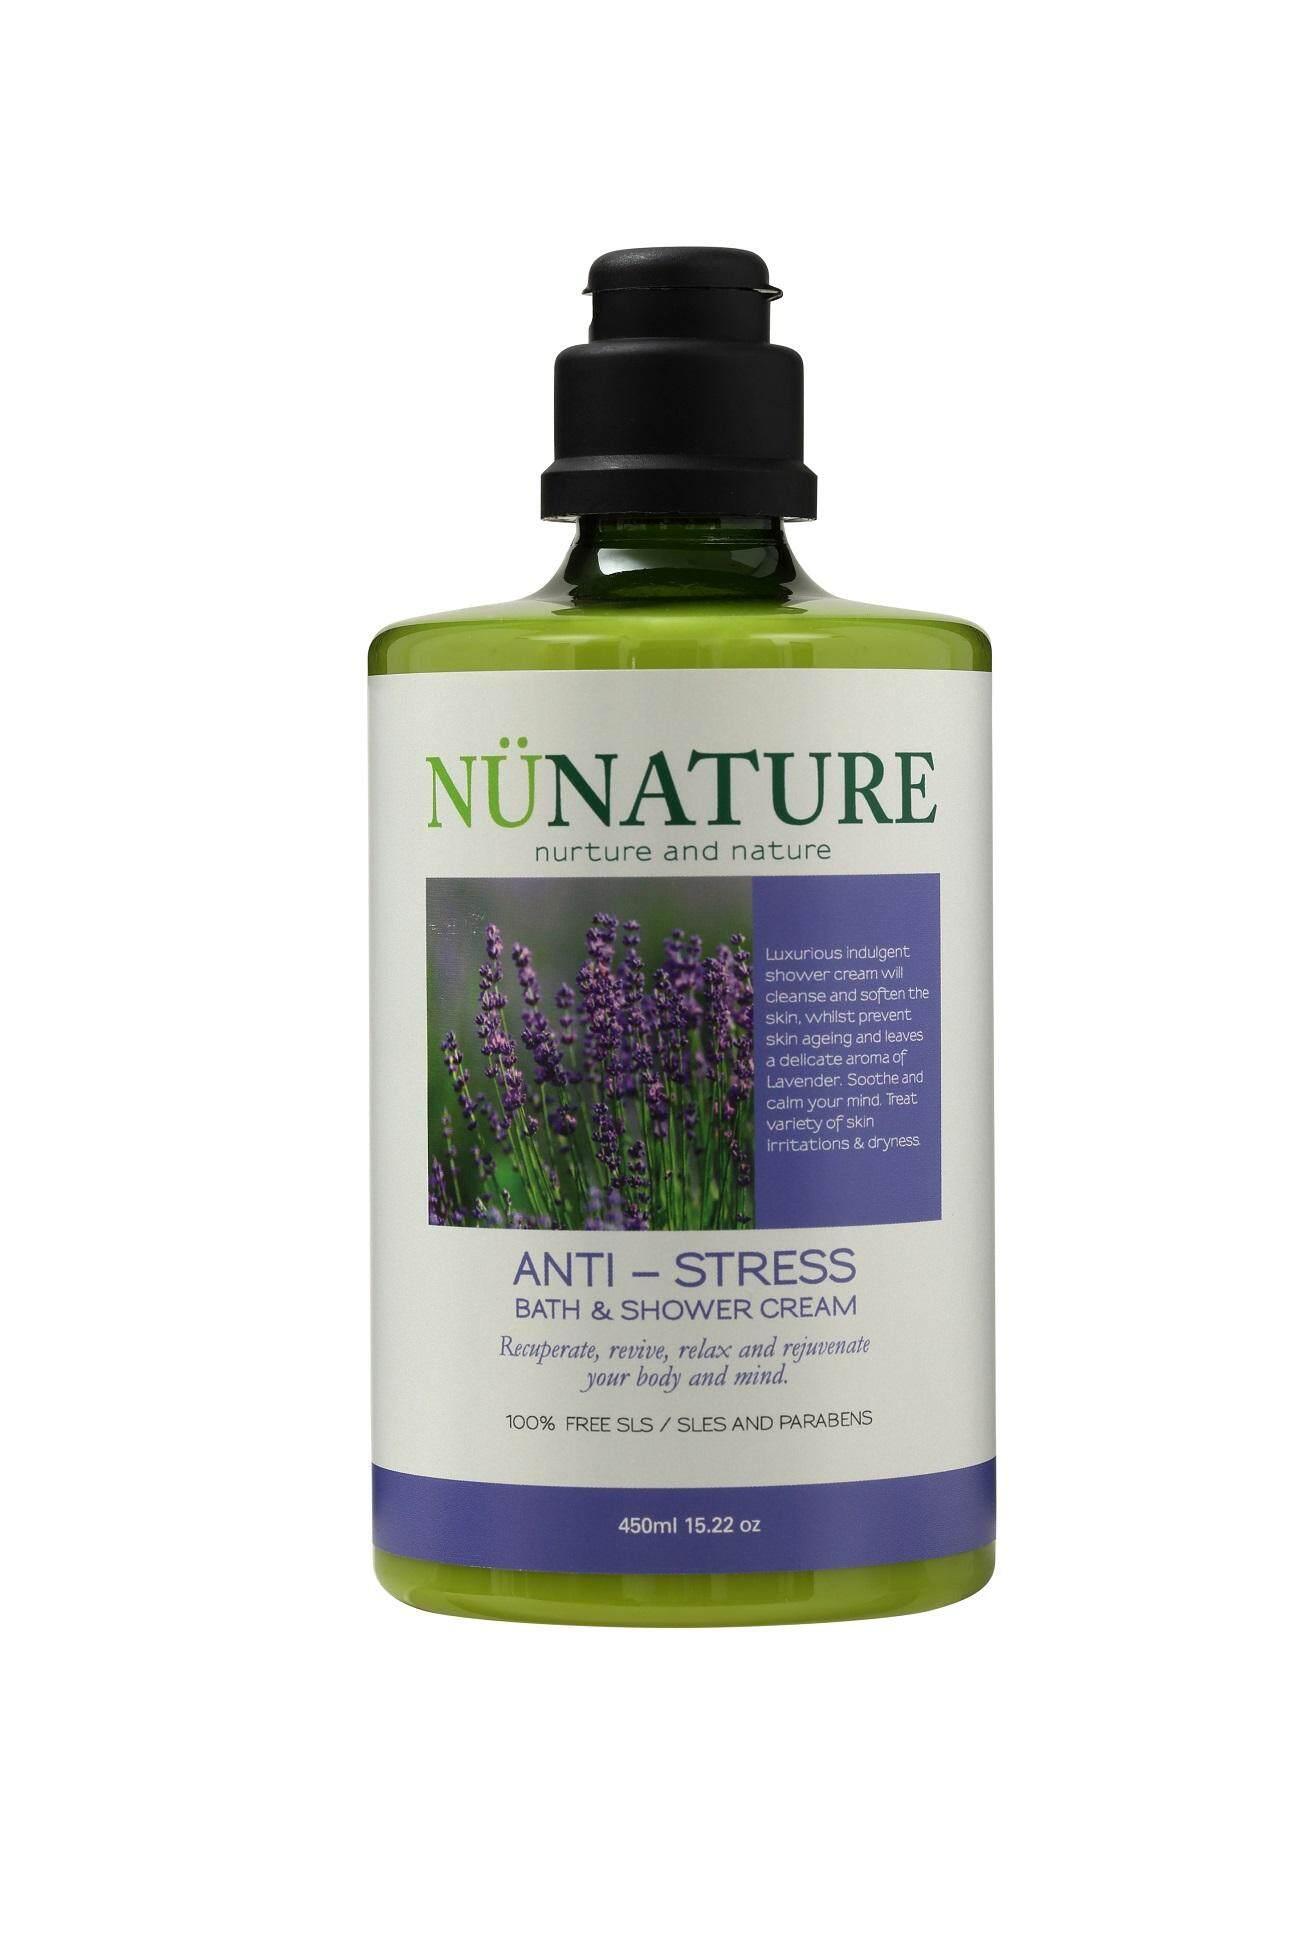 Features Lancome Hydra Zen Anti Stress Moisturising Cream Gel 15g Lancme 50ml Nunature Bath Shower 450ml